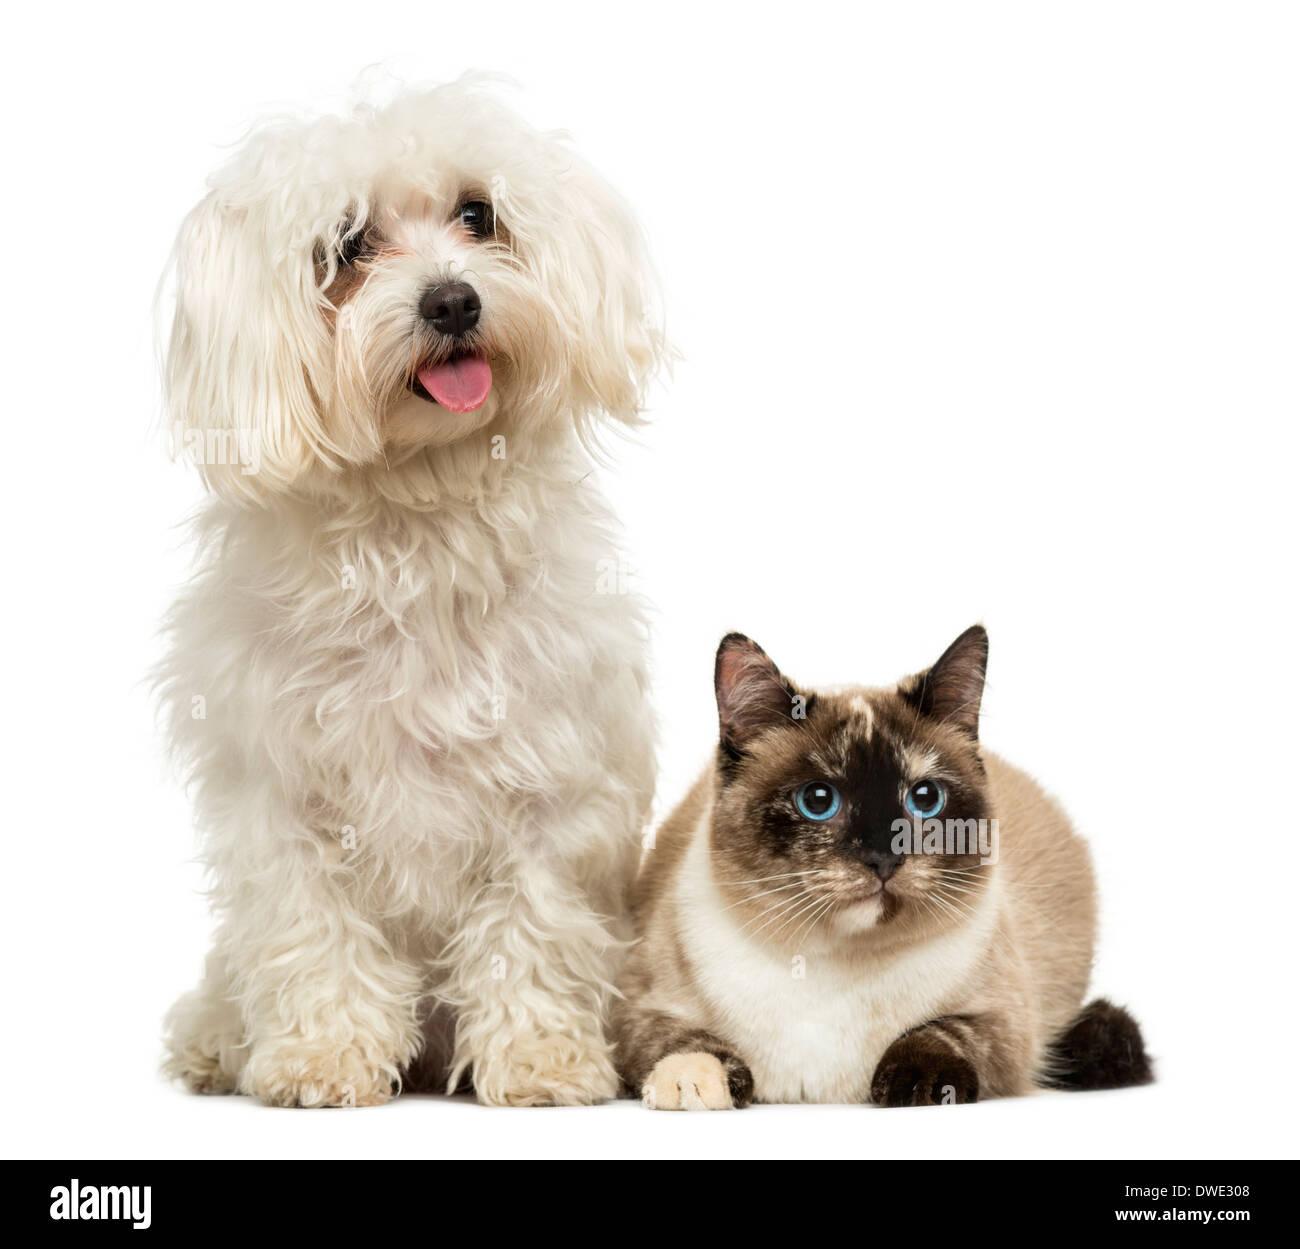 Maltese panting and Birman cat against white background - Stock Image